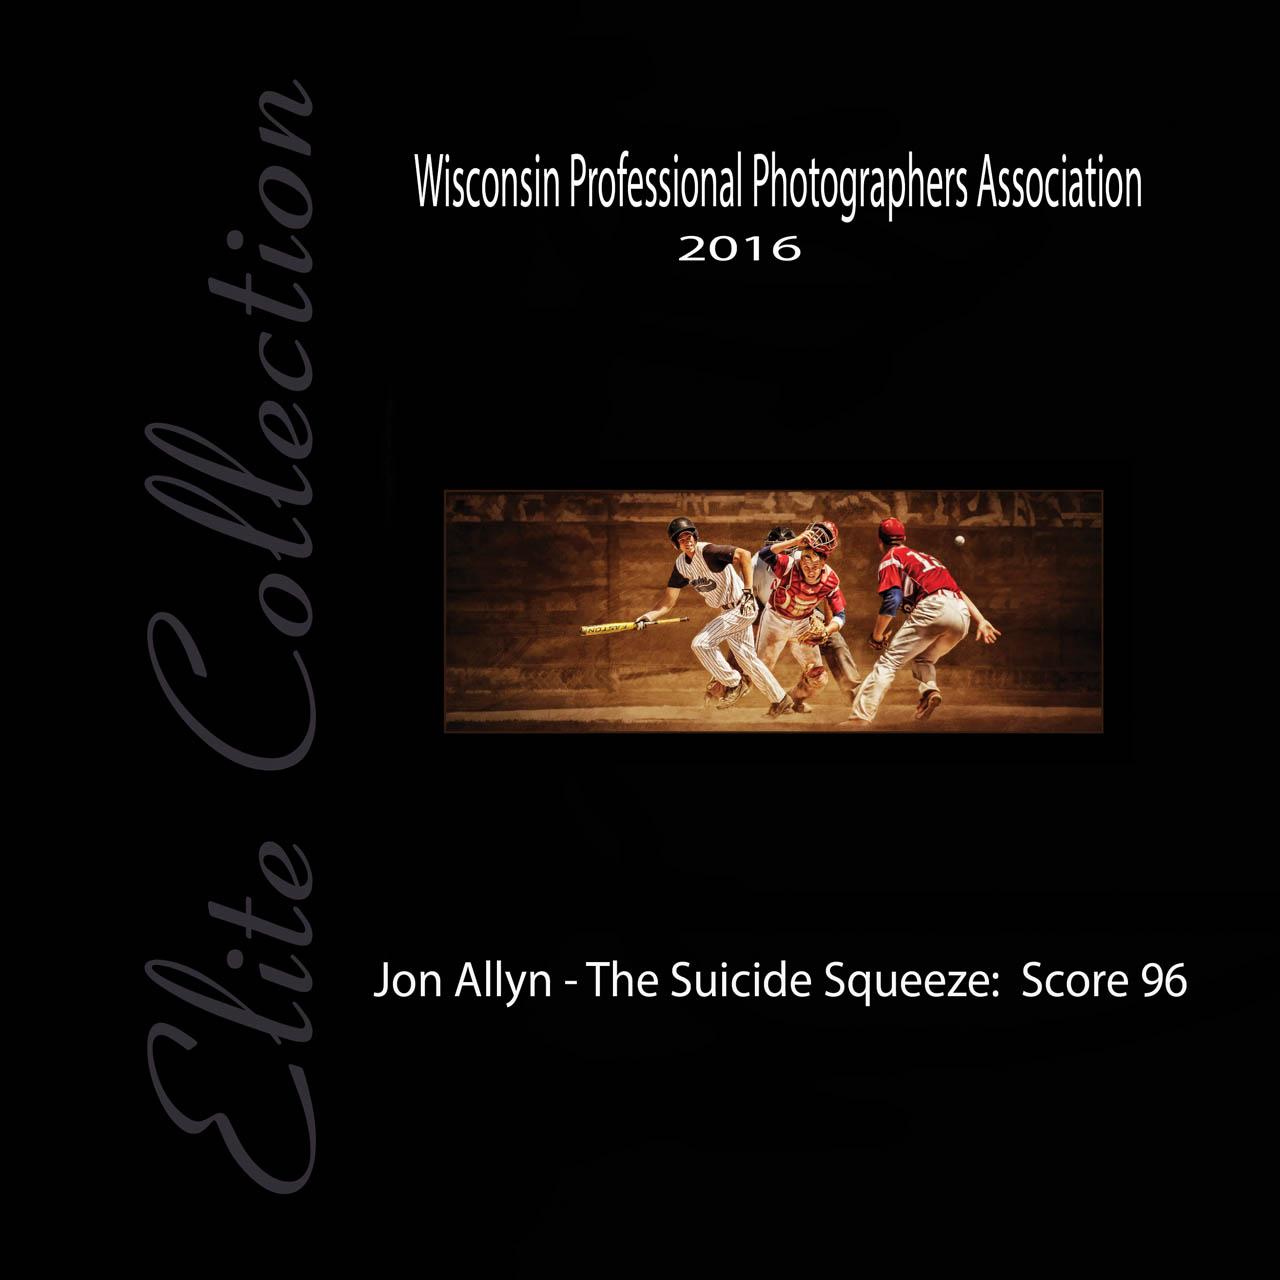 2016 Elite - Jon Allyn The Suicide Squeeze